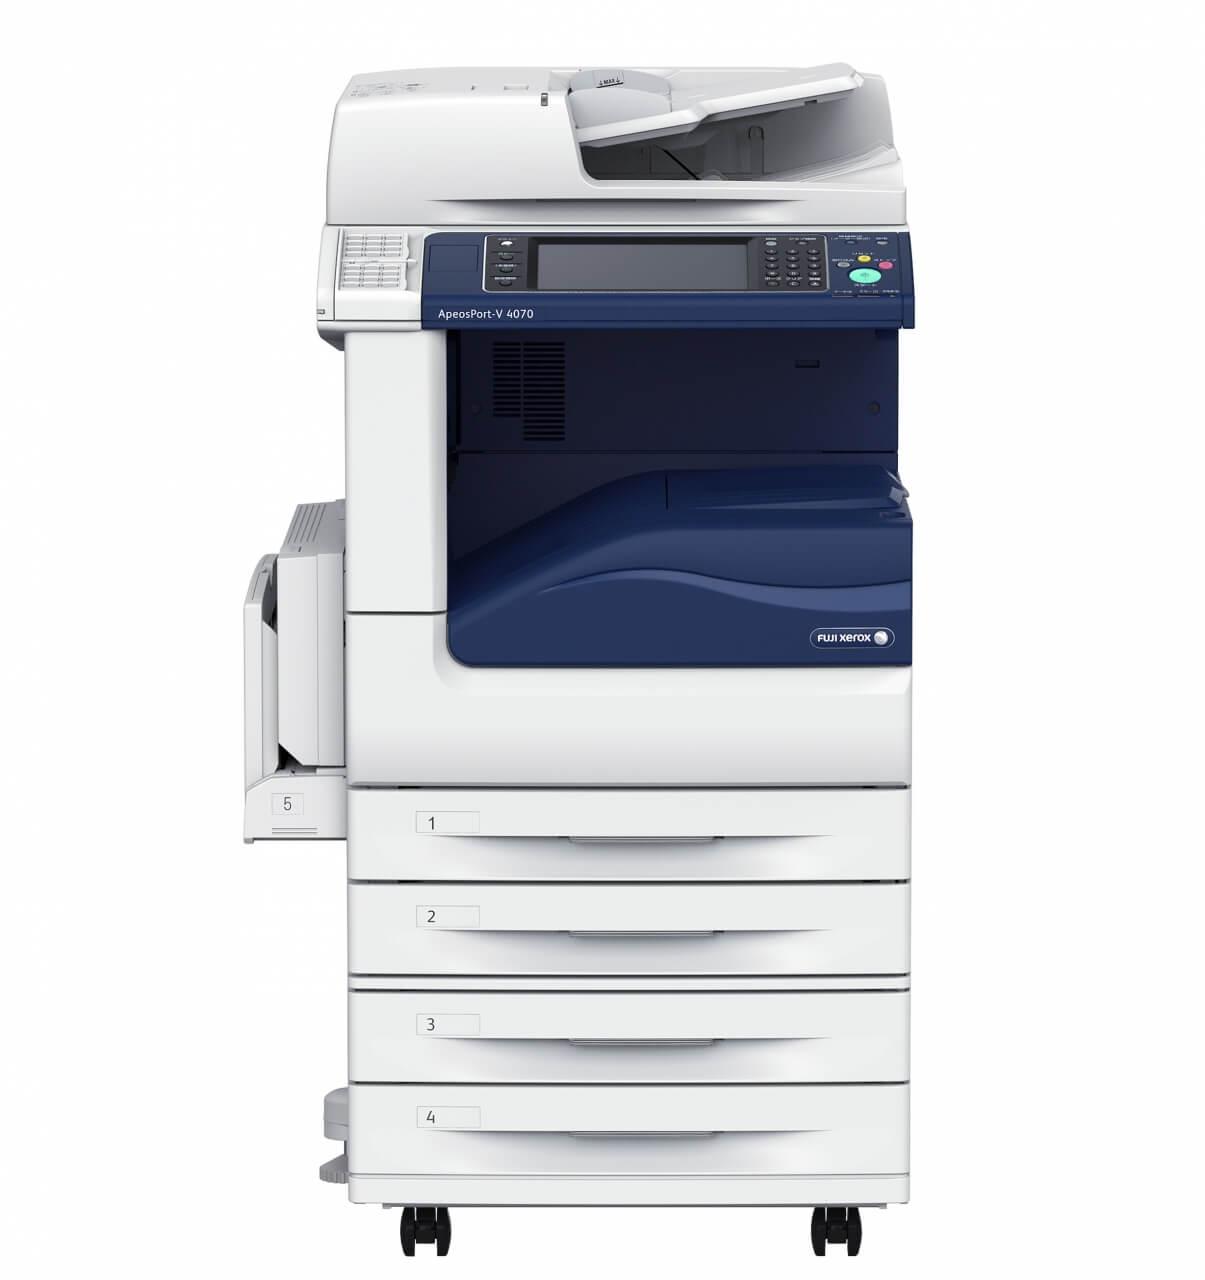 Fuji Xerox DocuCentre/ApeosPort-V 4070/5070